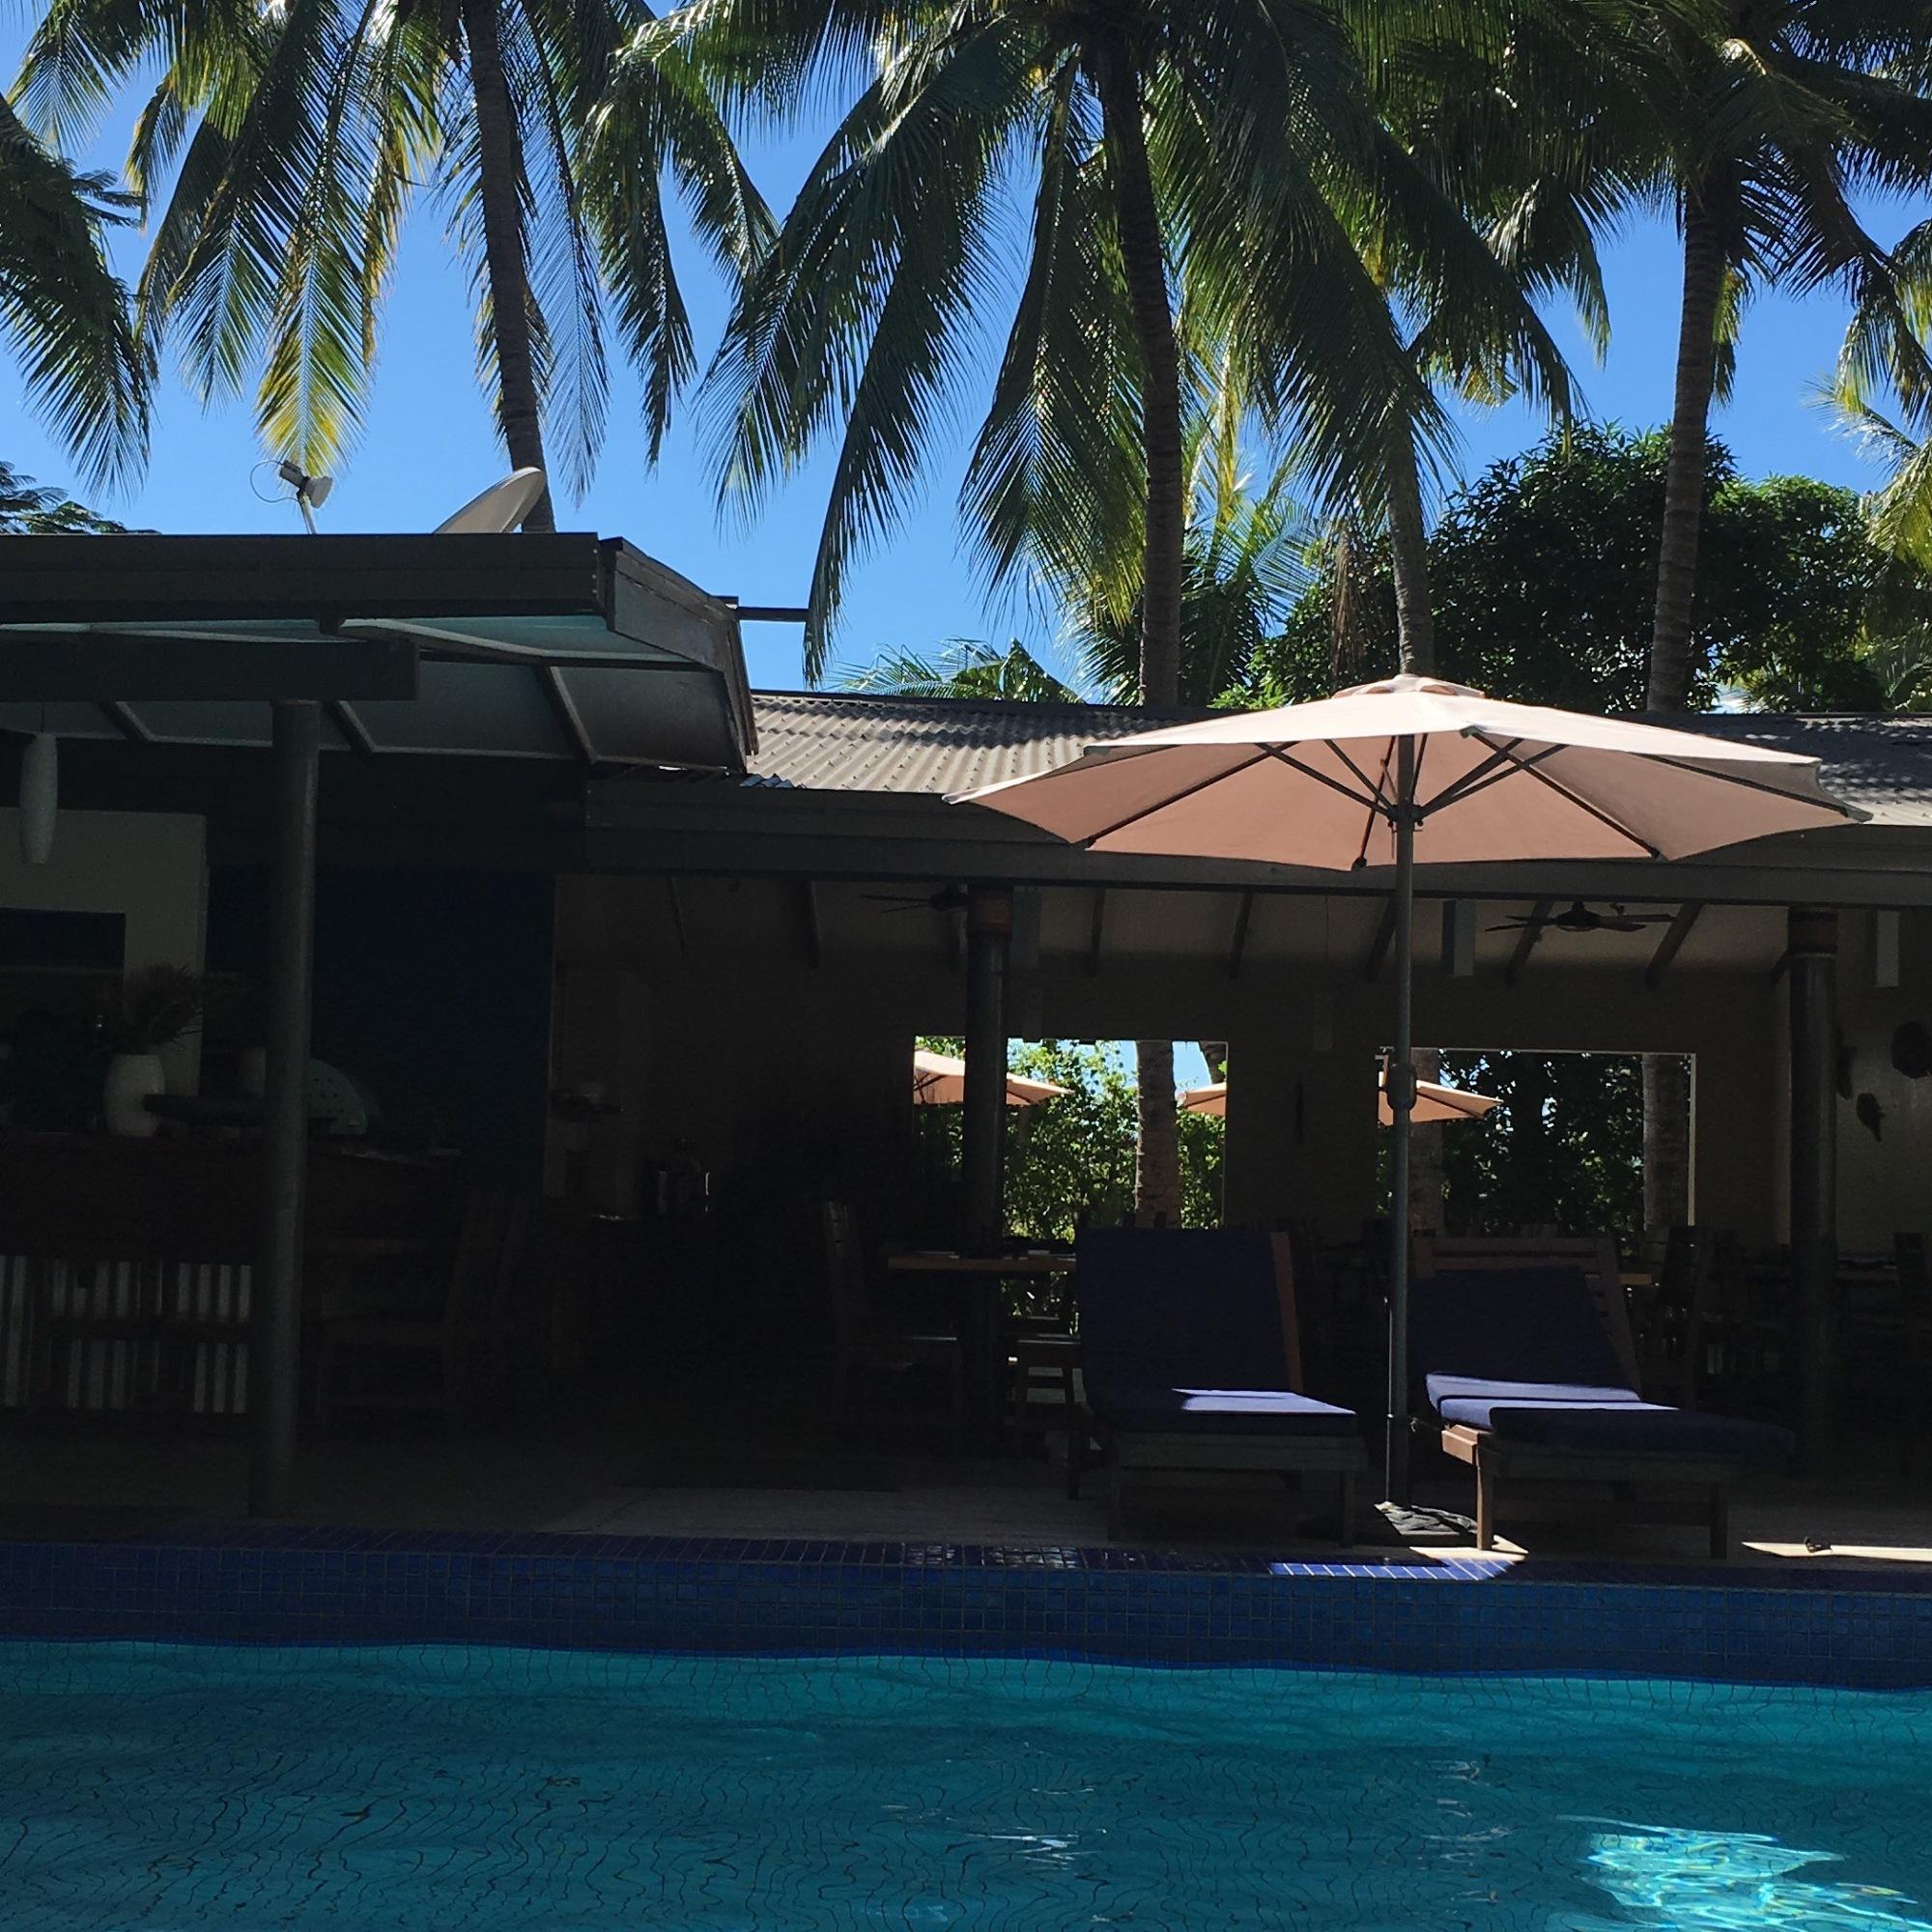 Hotelpool Oasis Palms